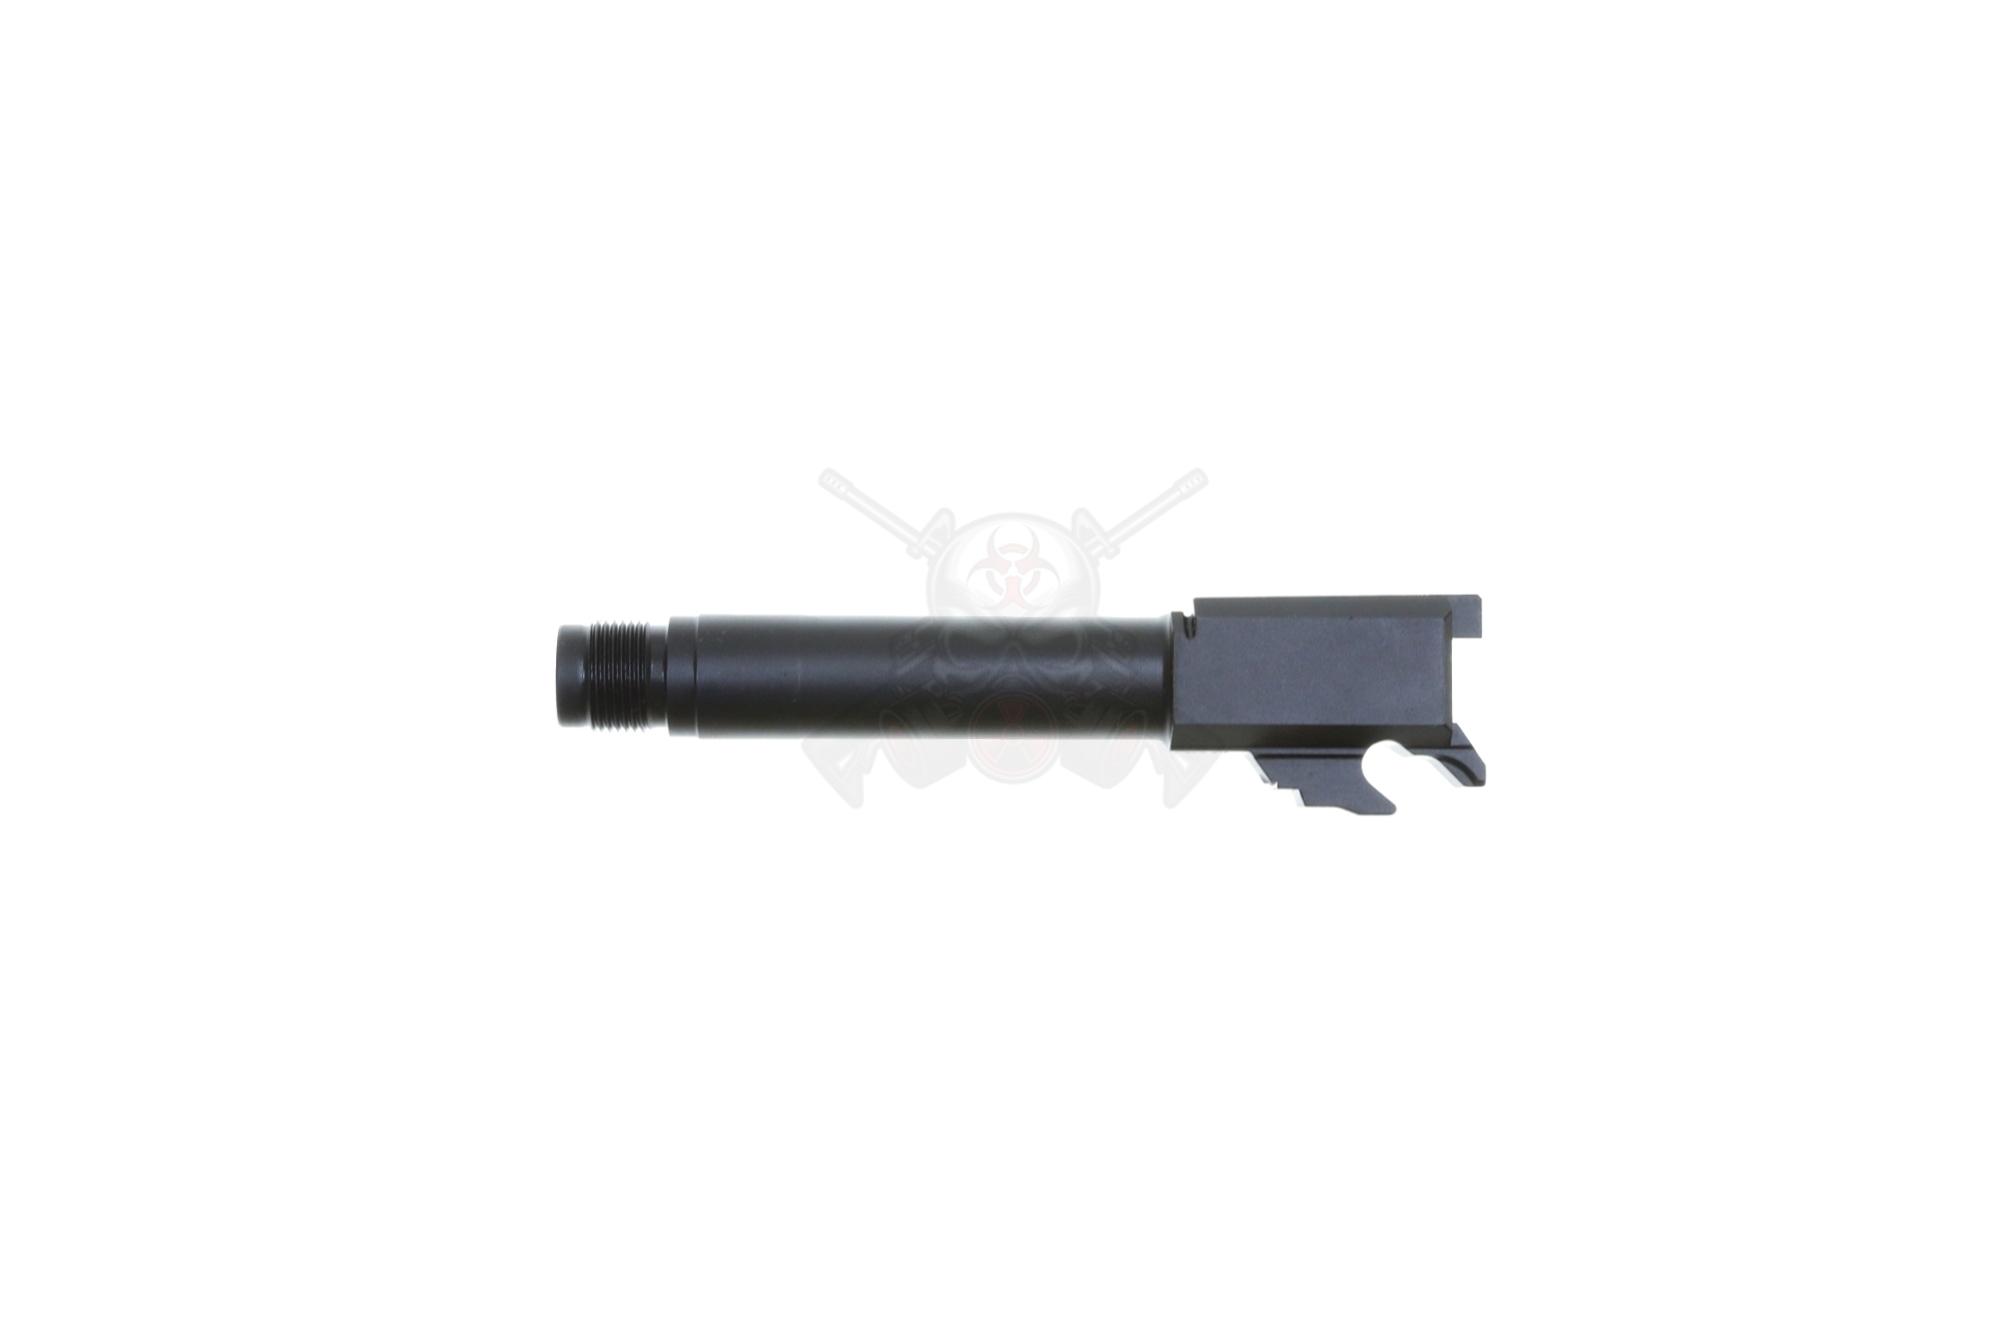 RCM Heckler and Koch HK VP9SK Threaded Barrel 1/2x28